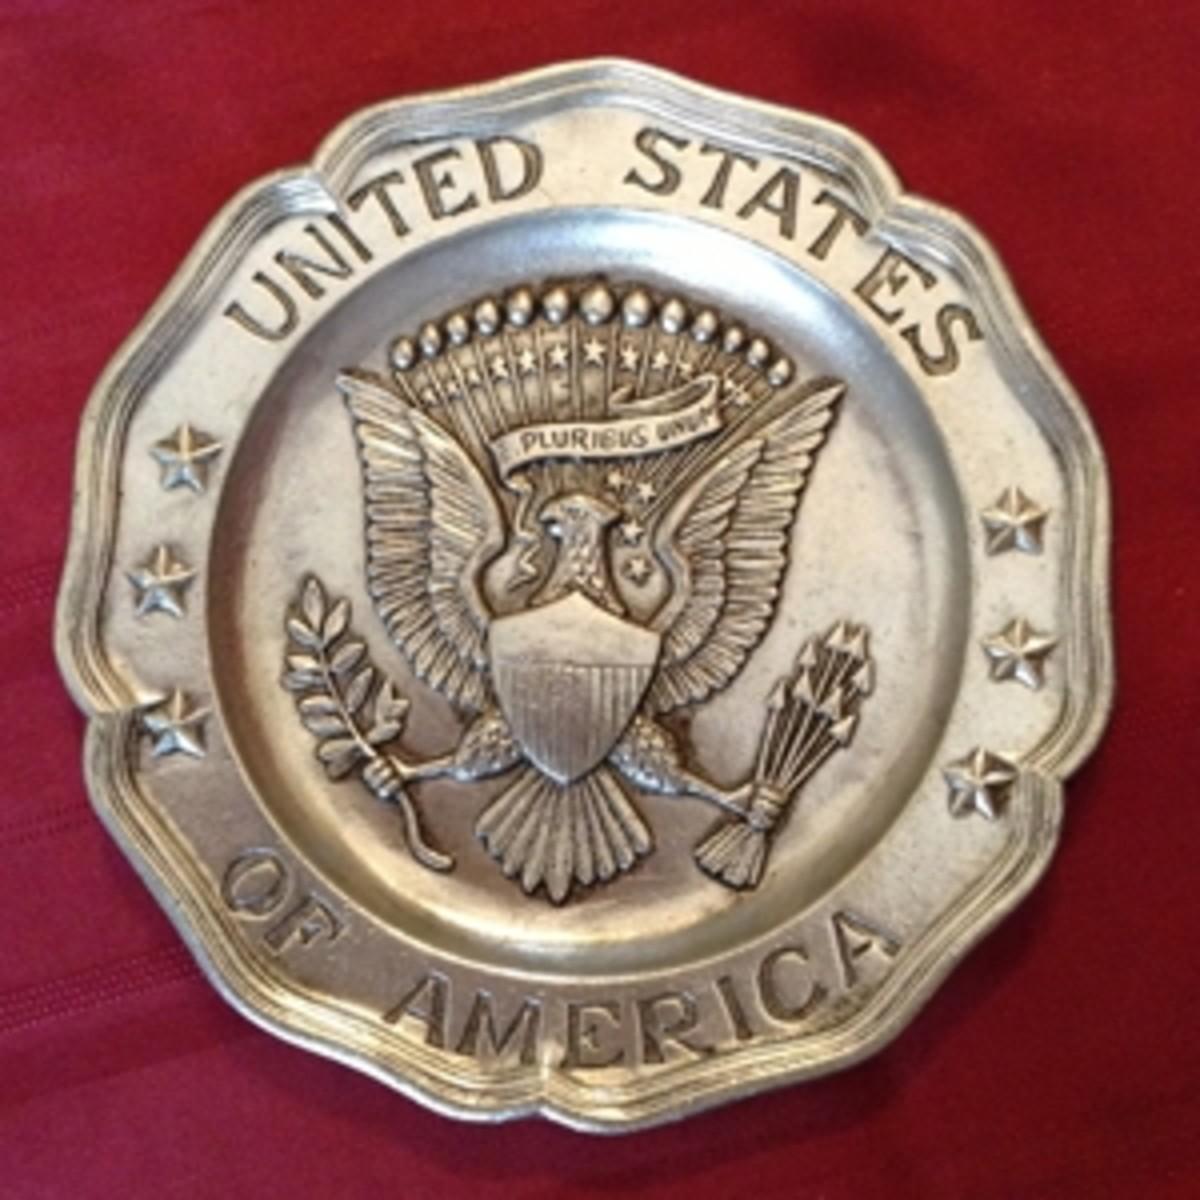 United States of America Crest